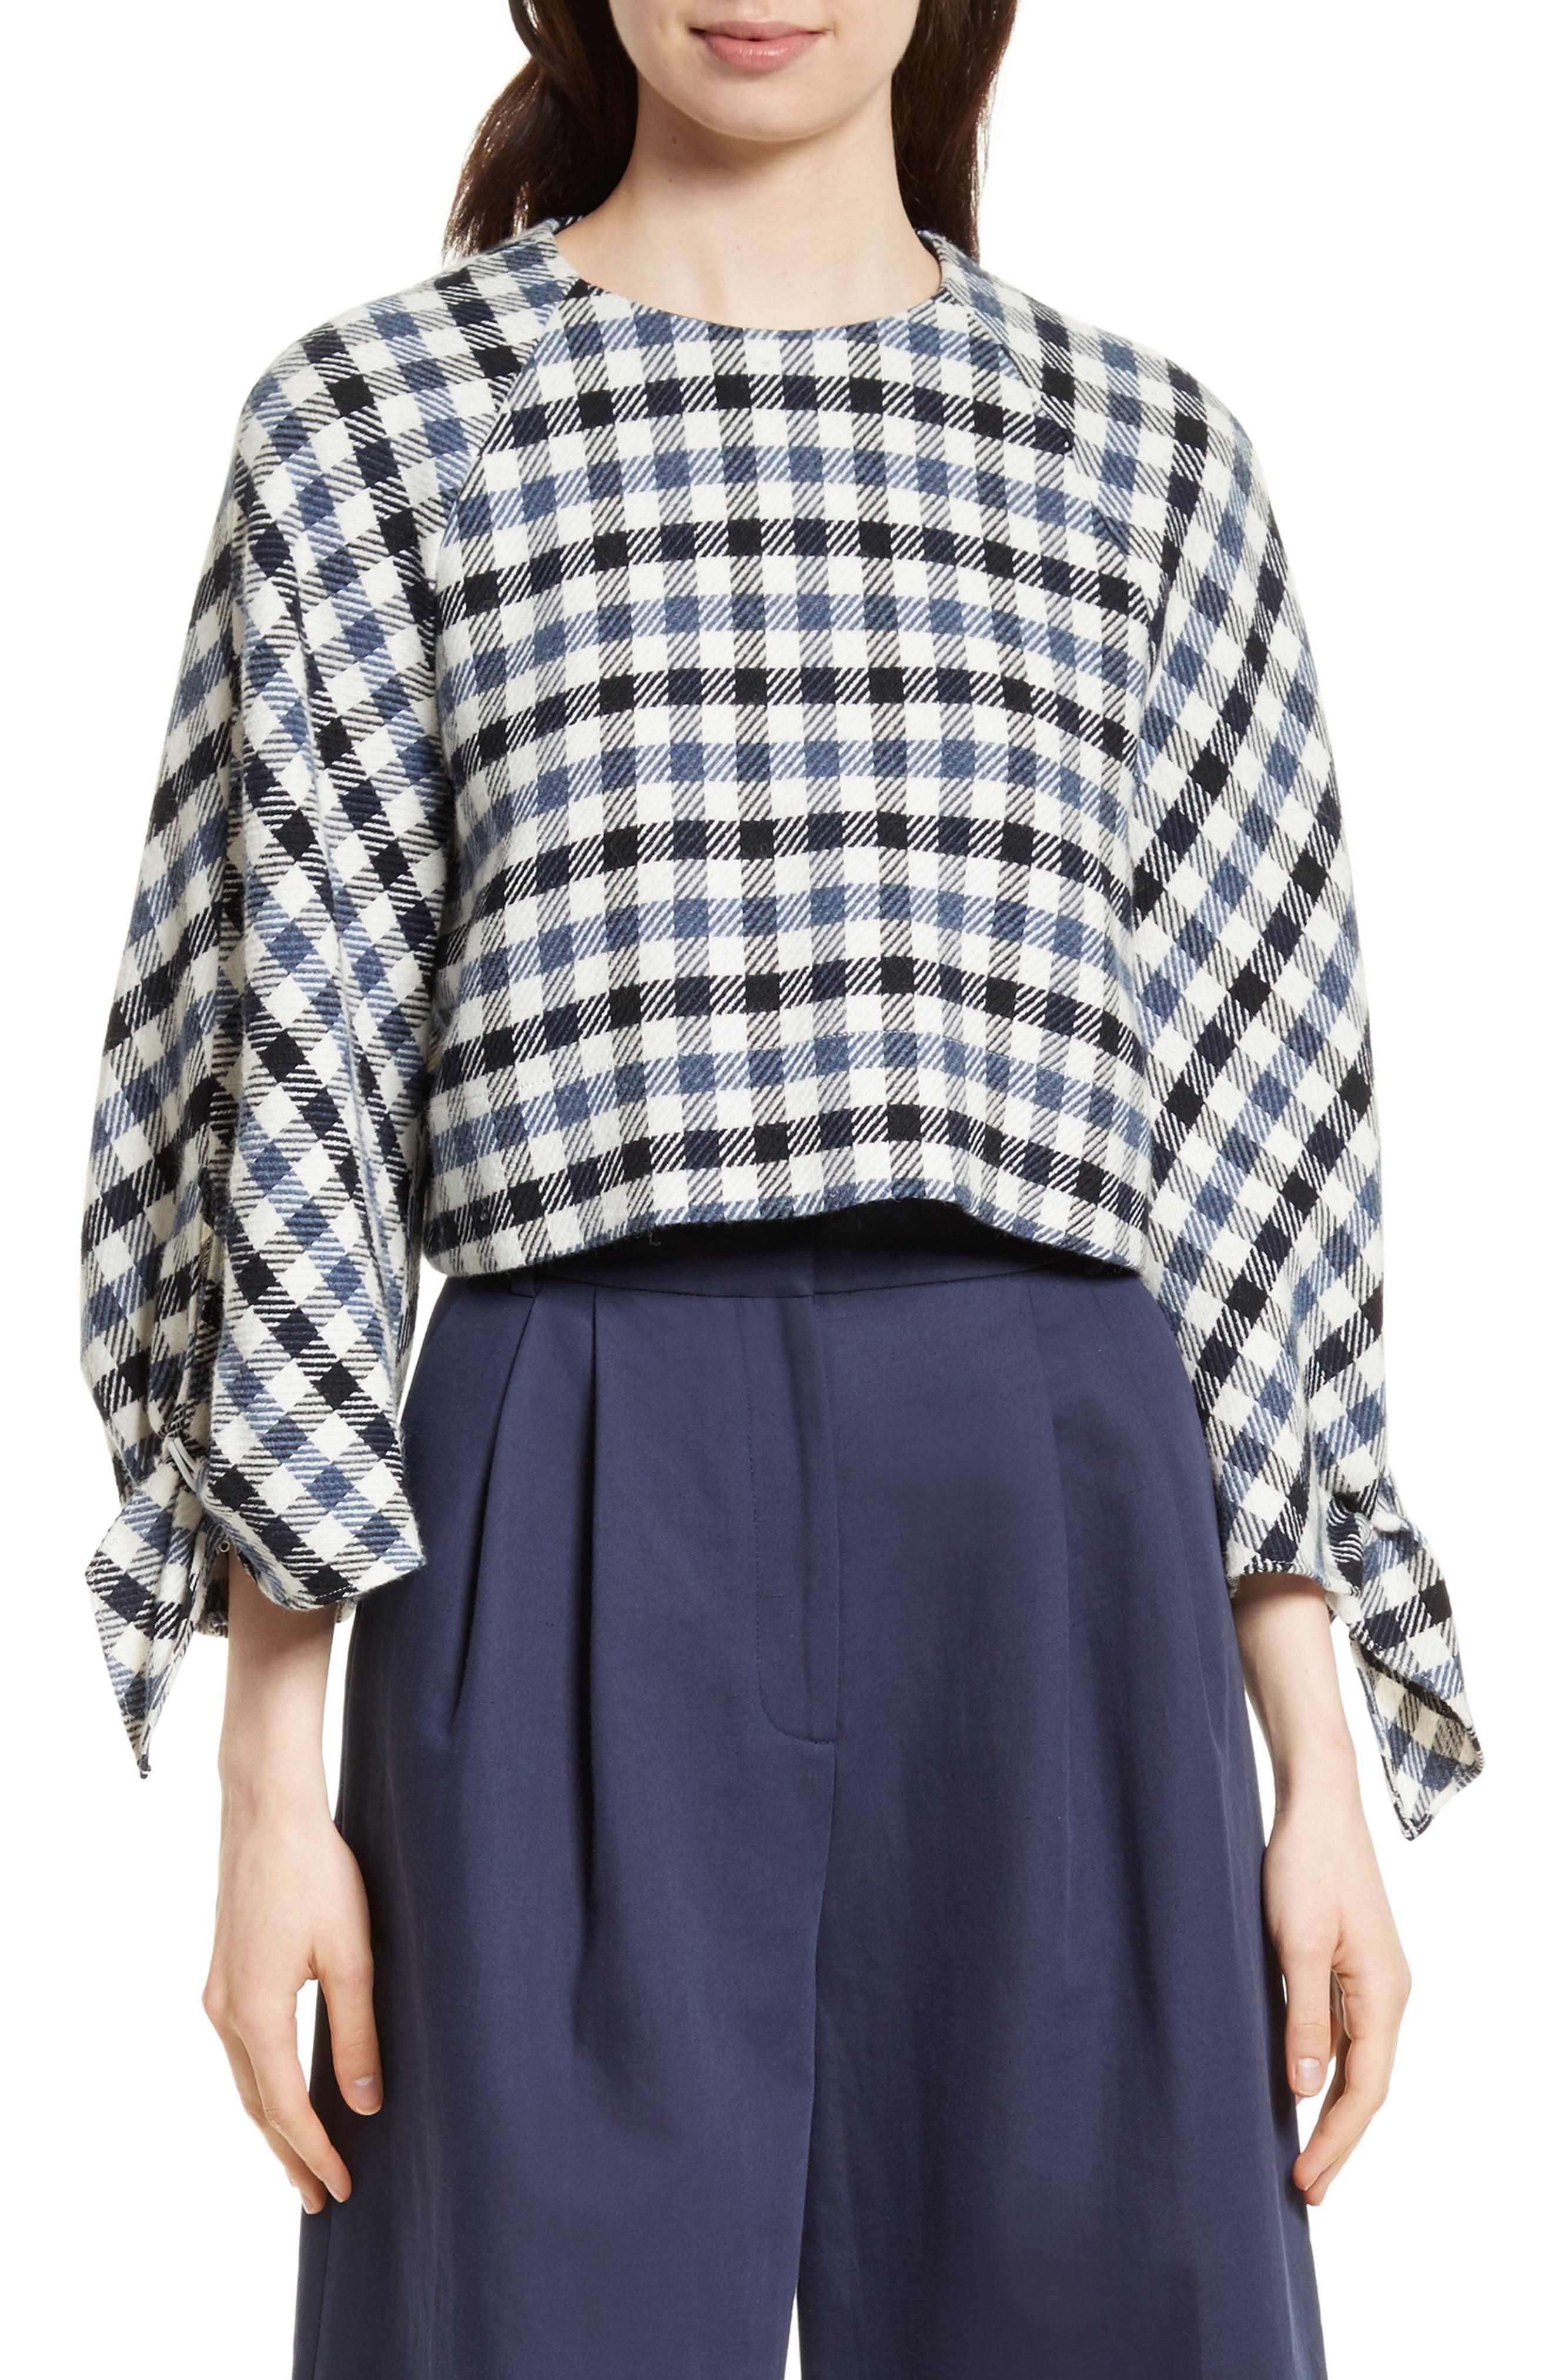 Fairfax Gingham Tie Sleeve Crop Top,                         Main,                         color, Blue Multi